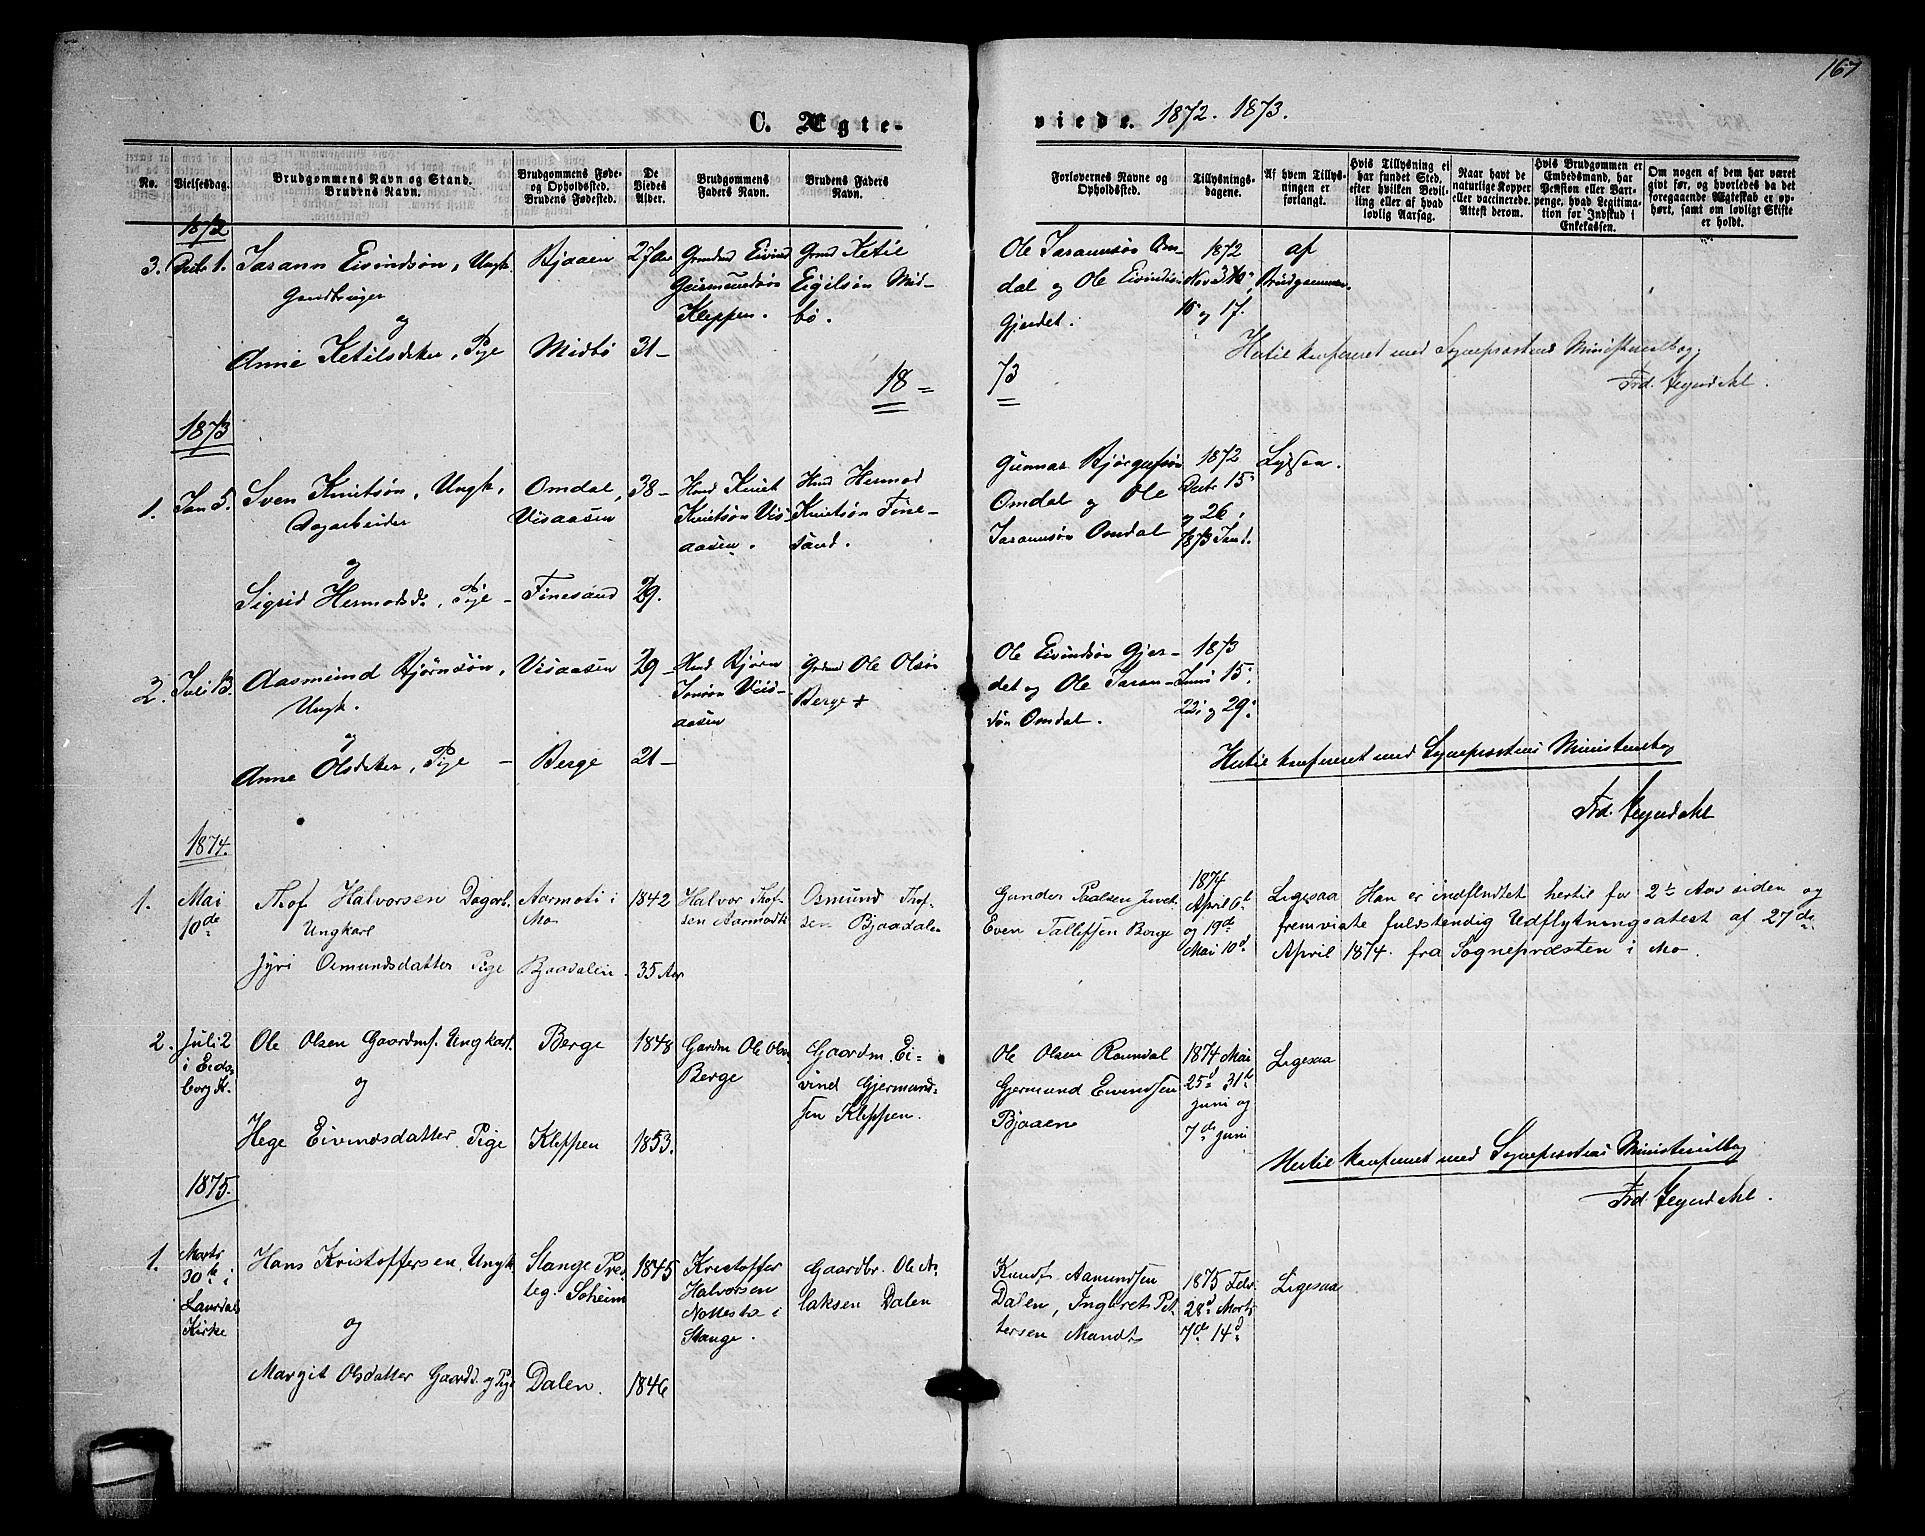 SAKO, Lårdal kirkebøker, G/Gb/L0002: Klokkerbok nr. II 2, 1865-1888, s. 167